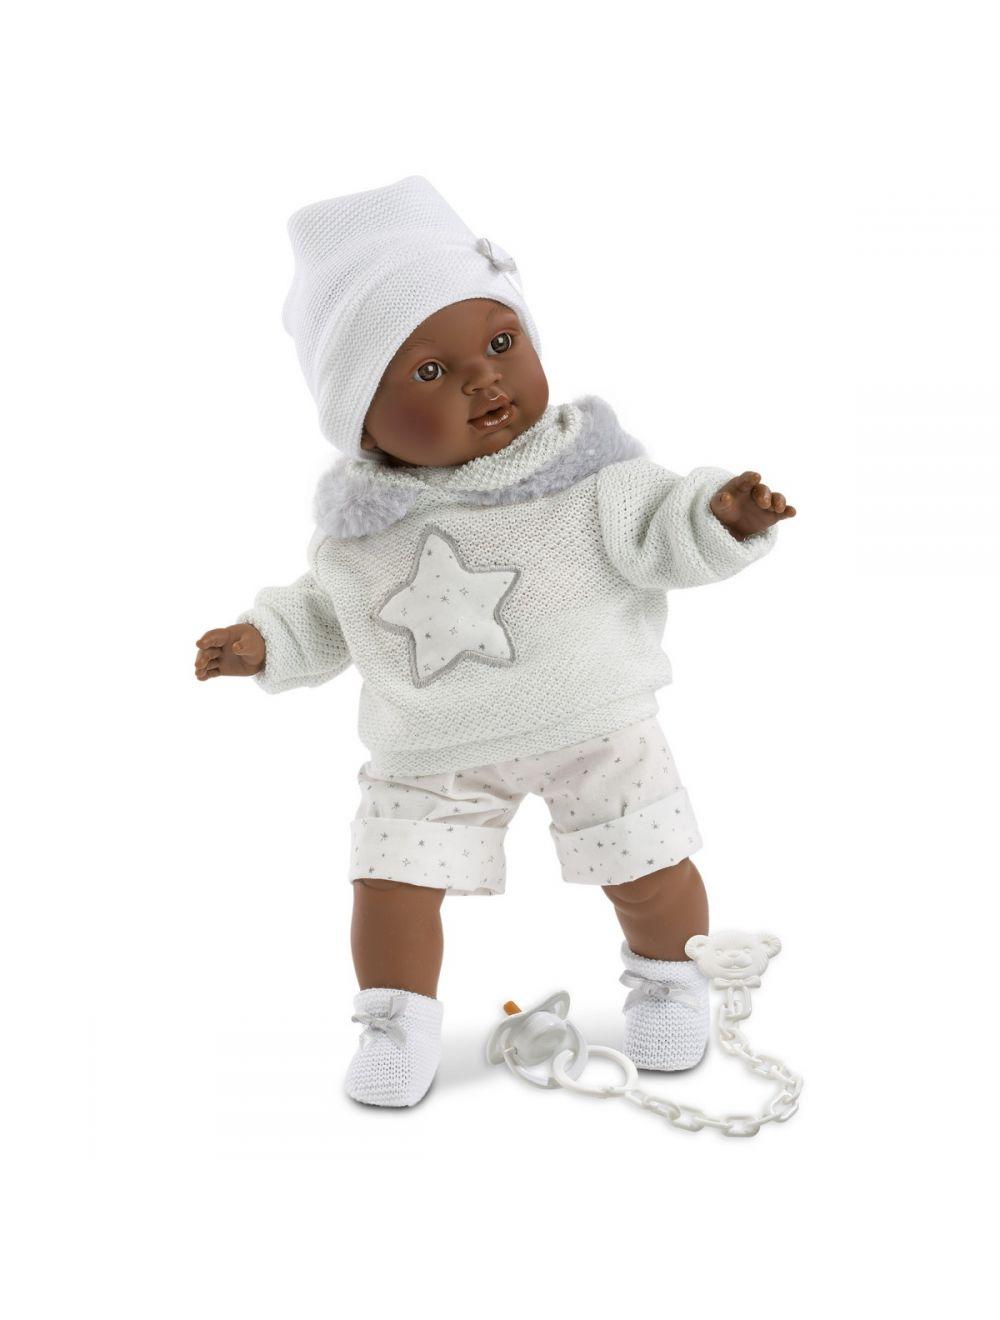 Llorens 38615 Lalka płacząca Sirham 38 cm biała bluzka i czapka